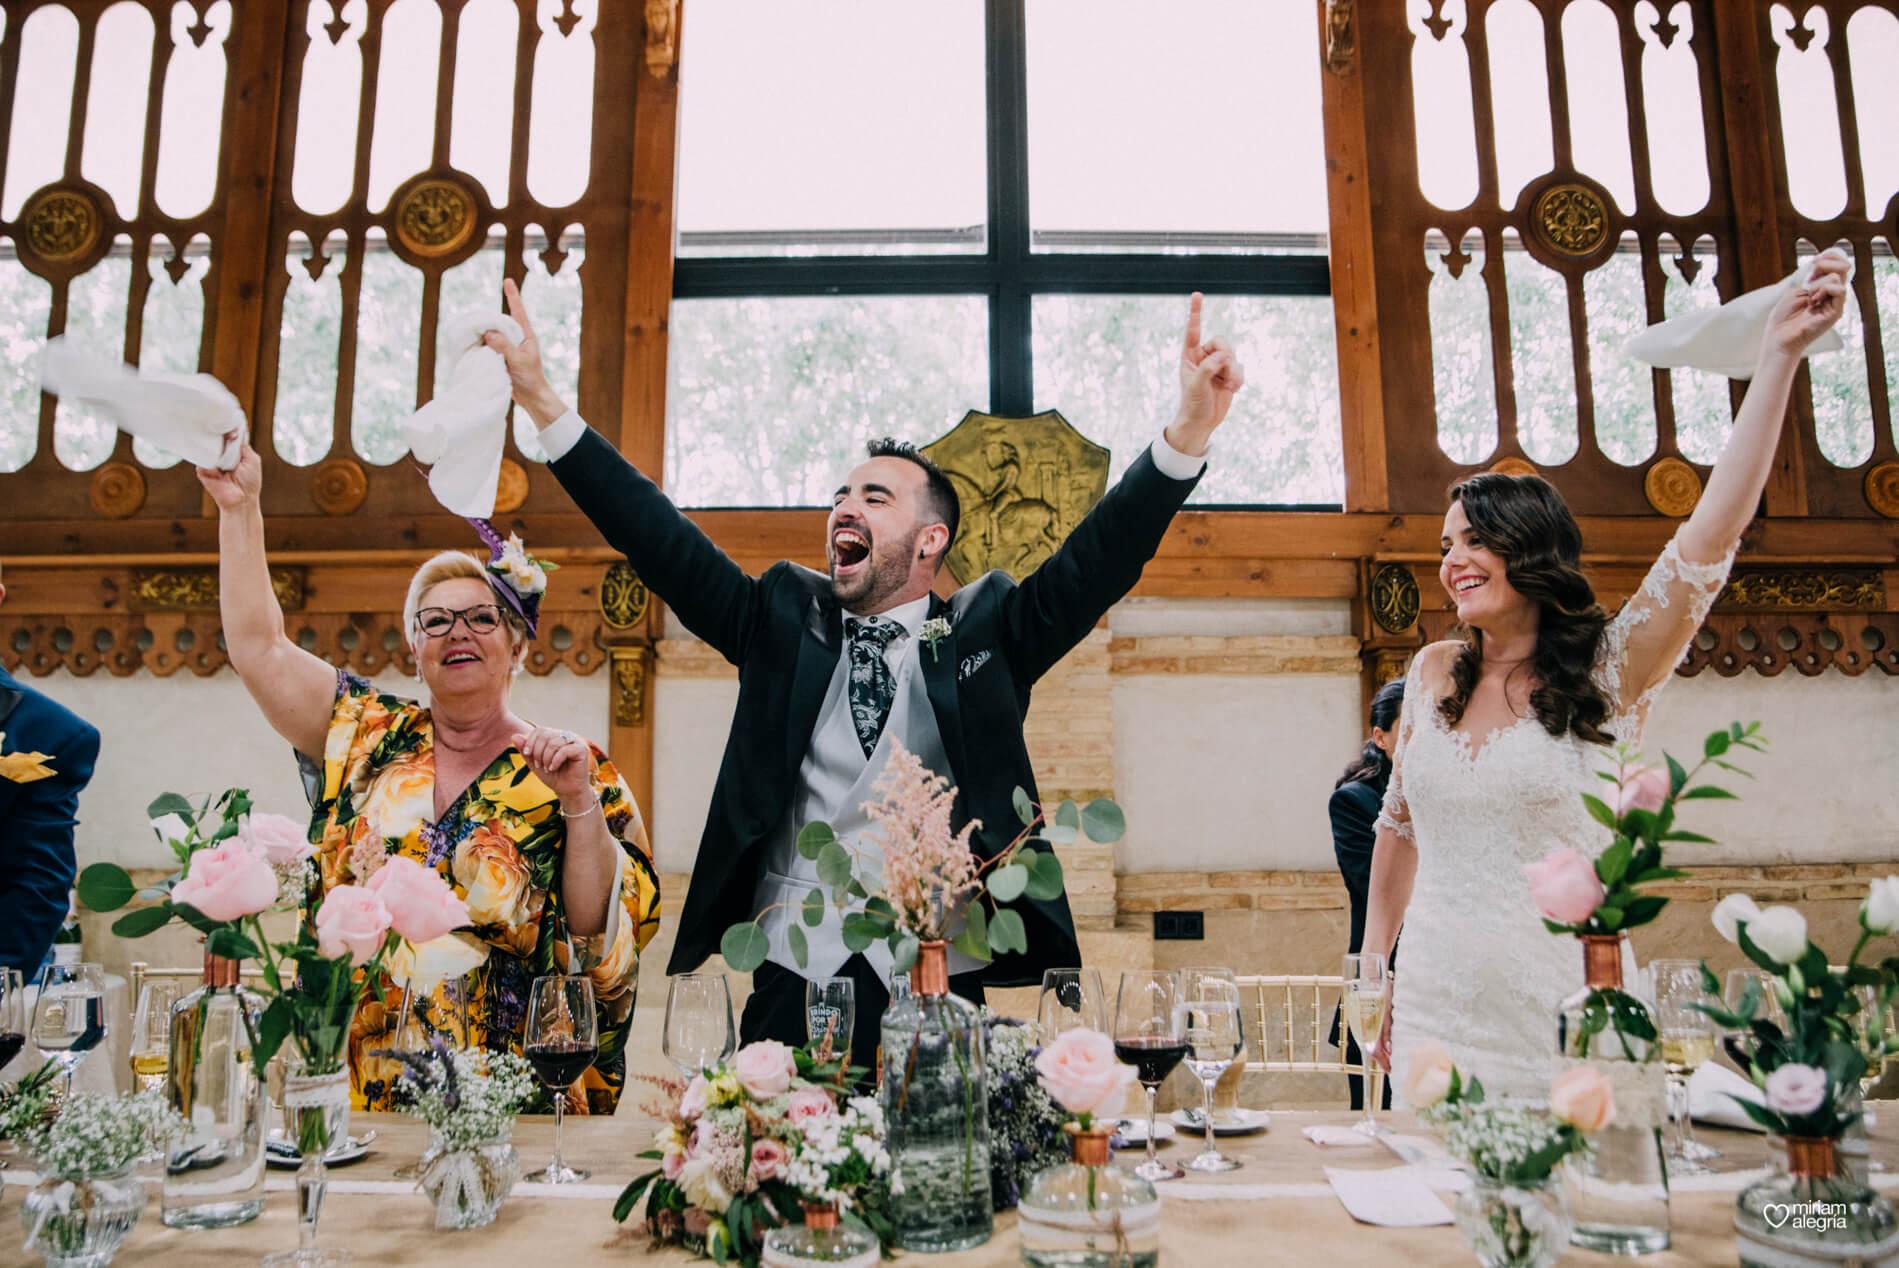 boda-en-finca-jurosa-miriam-alegria-120